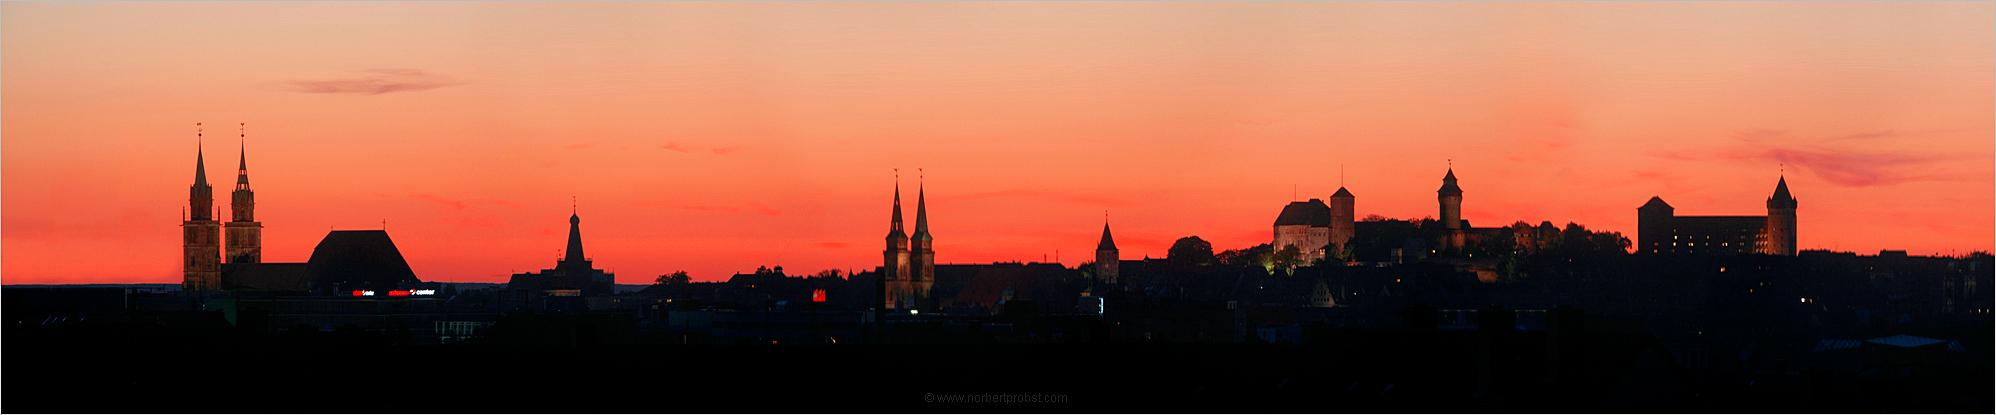 Sommerabend in Nürnberg